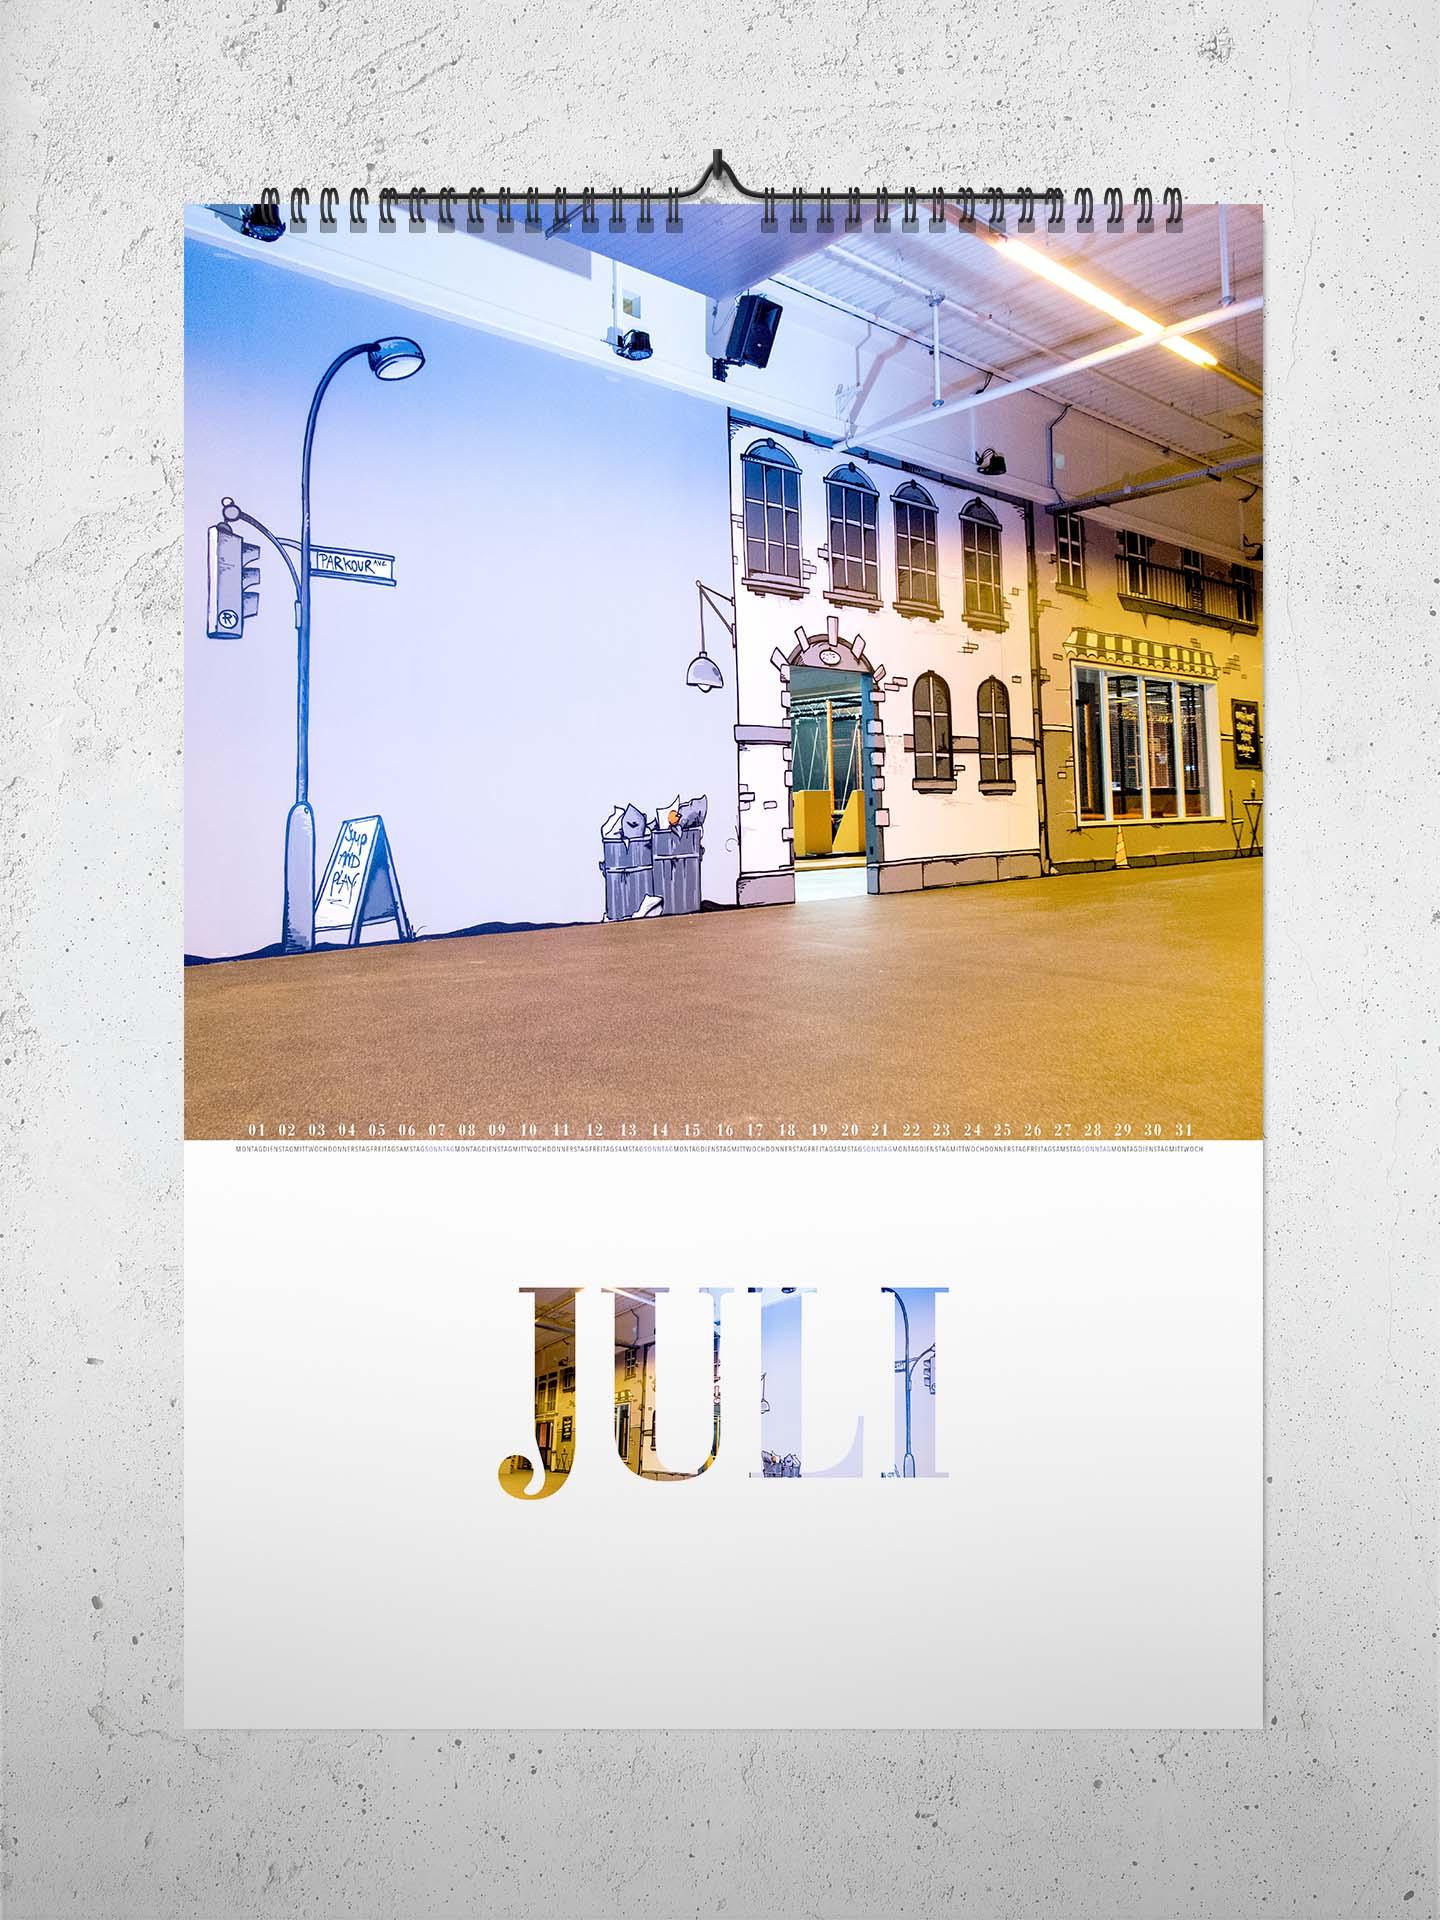 Graffiti-Design, Kalender, 2019, Graffiti, Design, Münster, Bennet, Grüttner, Auckz